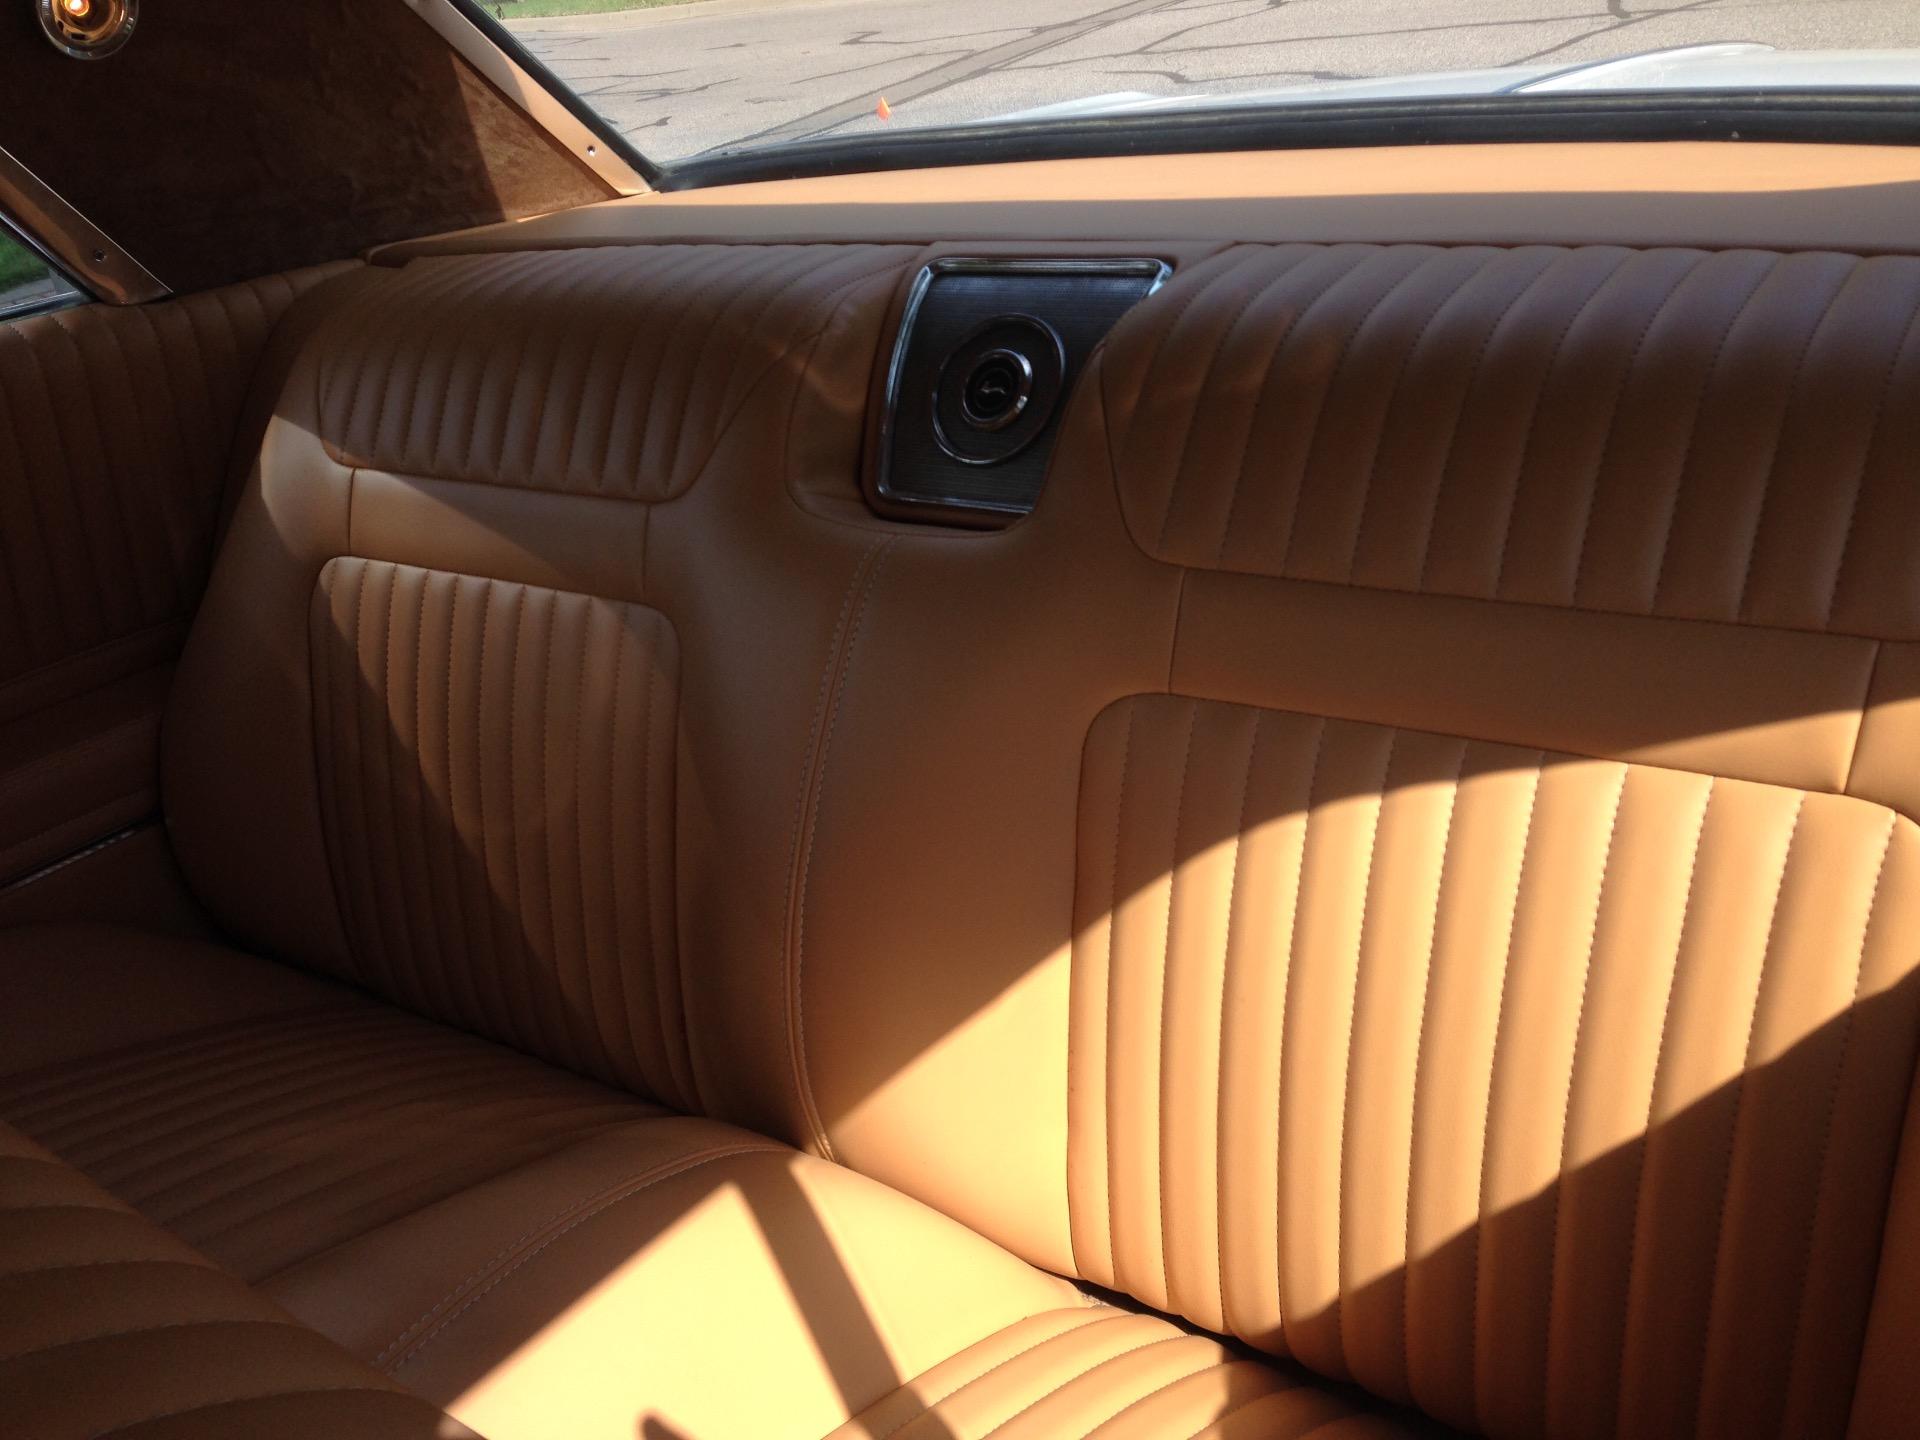 Used 1964 Chevrolet Impala Vintage AC | Mundelein, IL